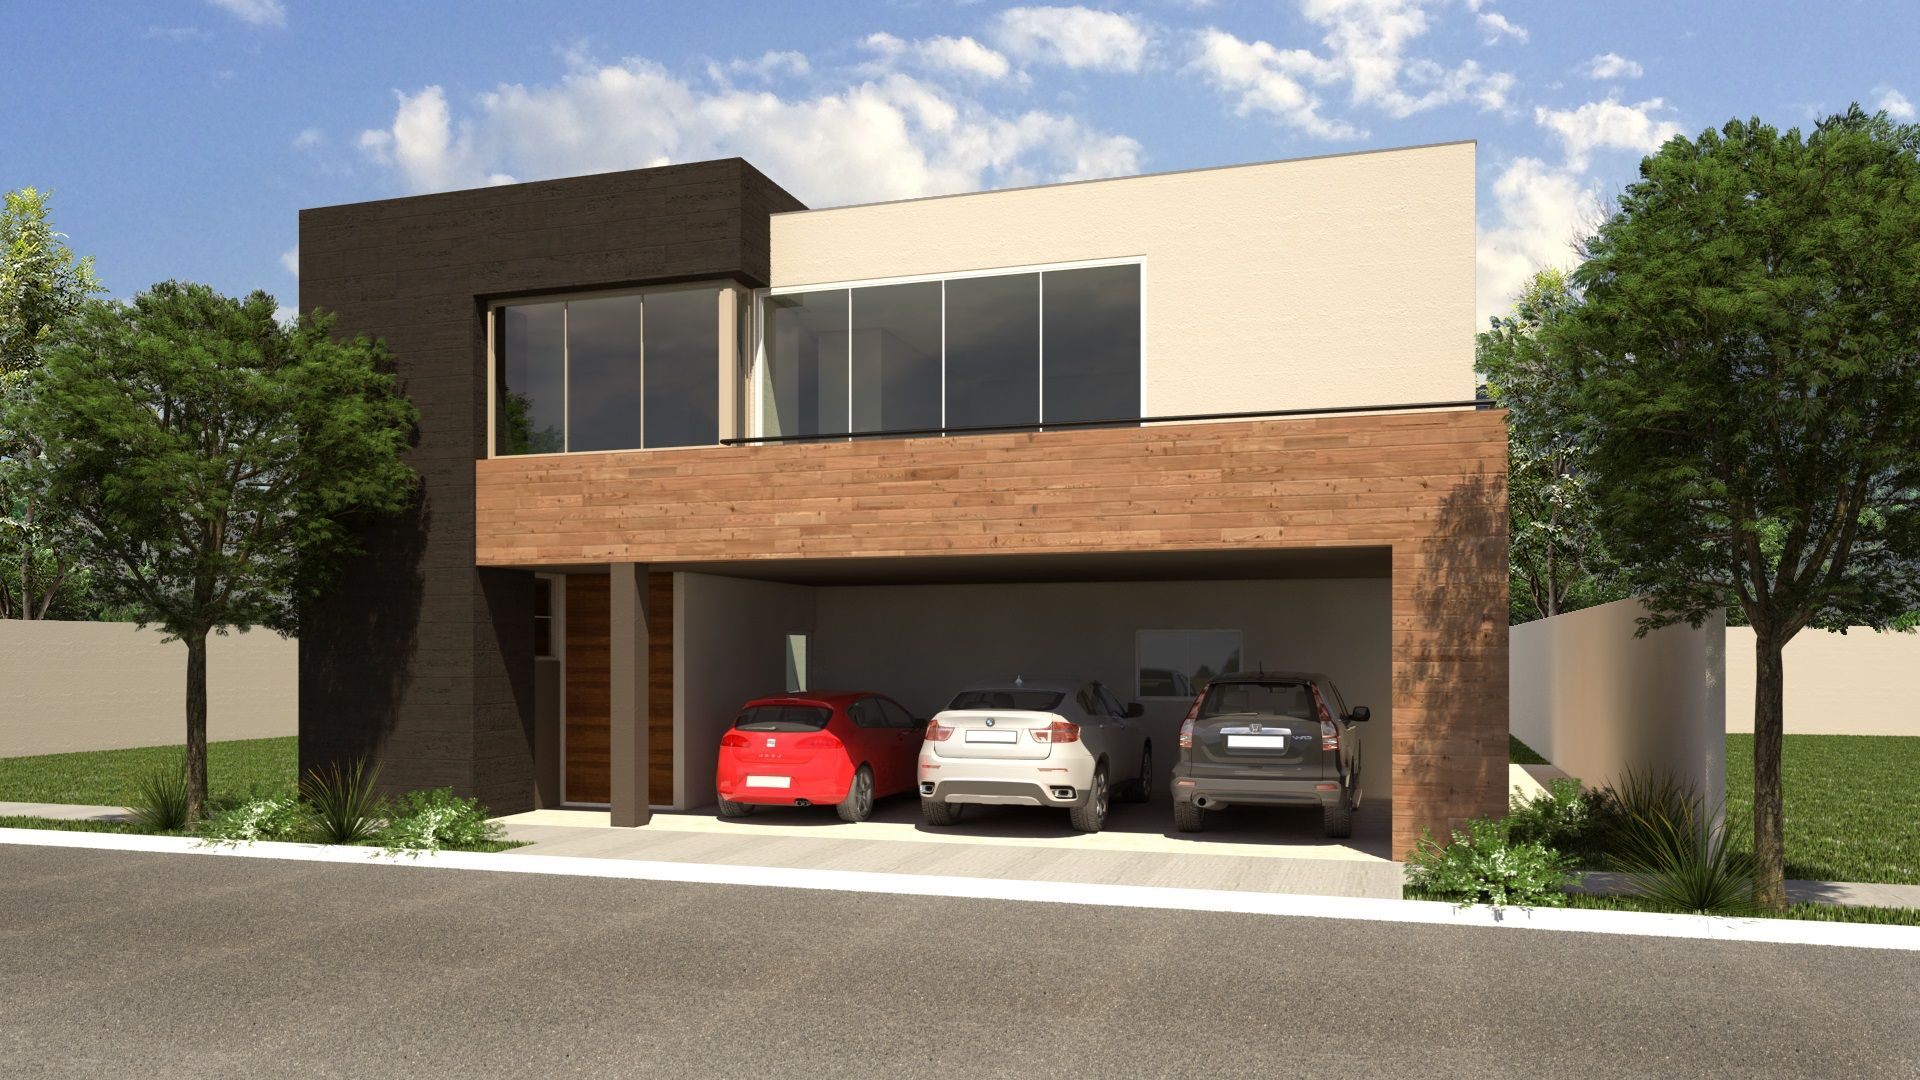 Cerezos residencial casas residenciales amuebladas en - Casas amuebladas modernas ...